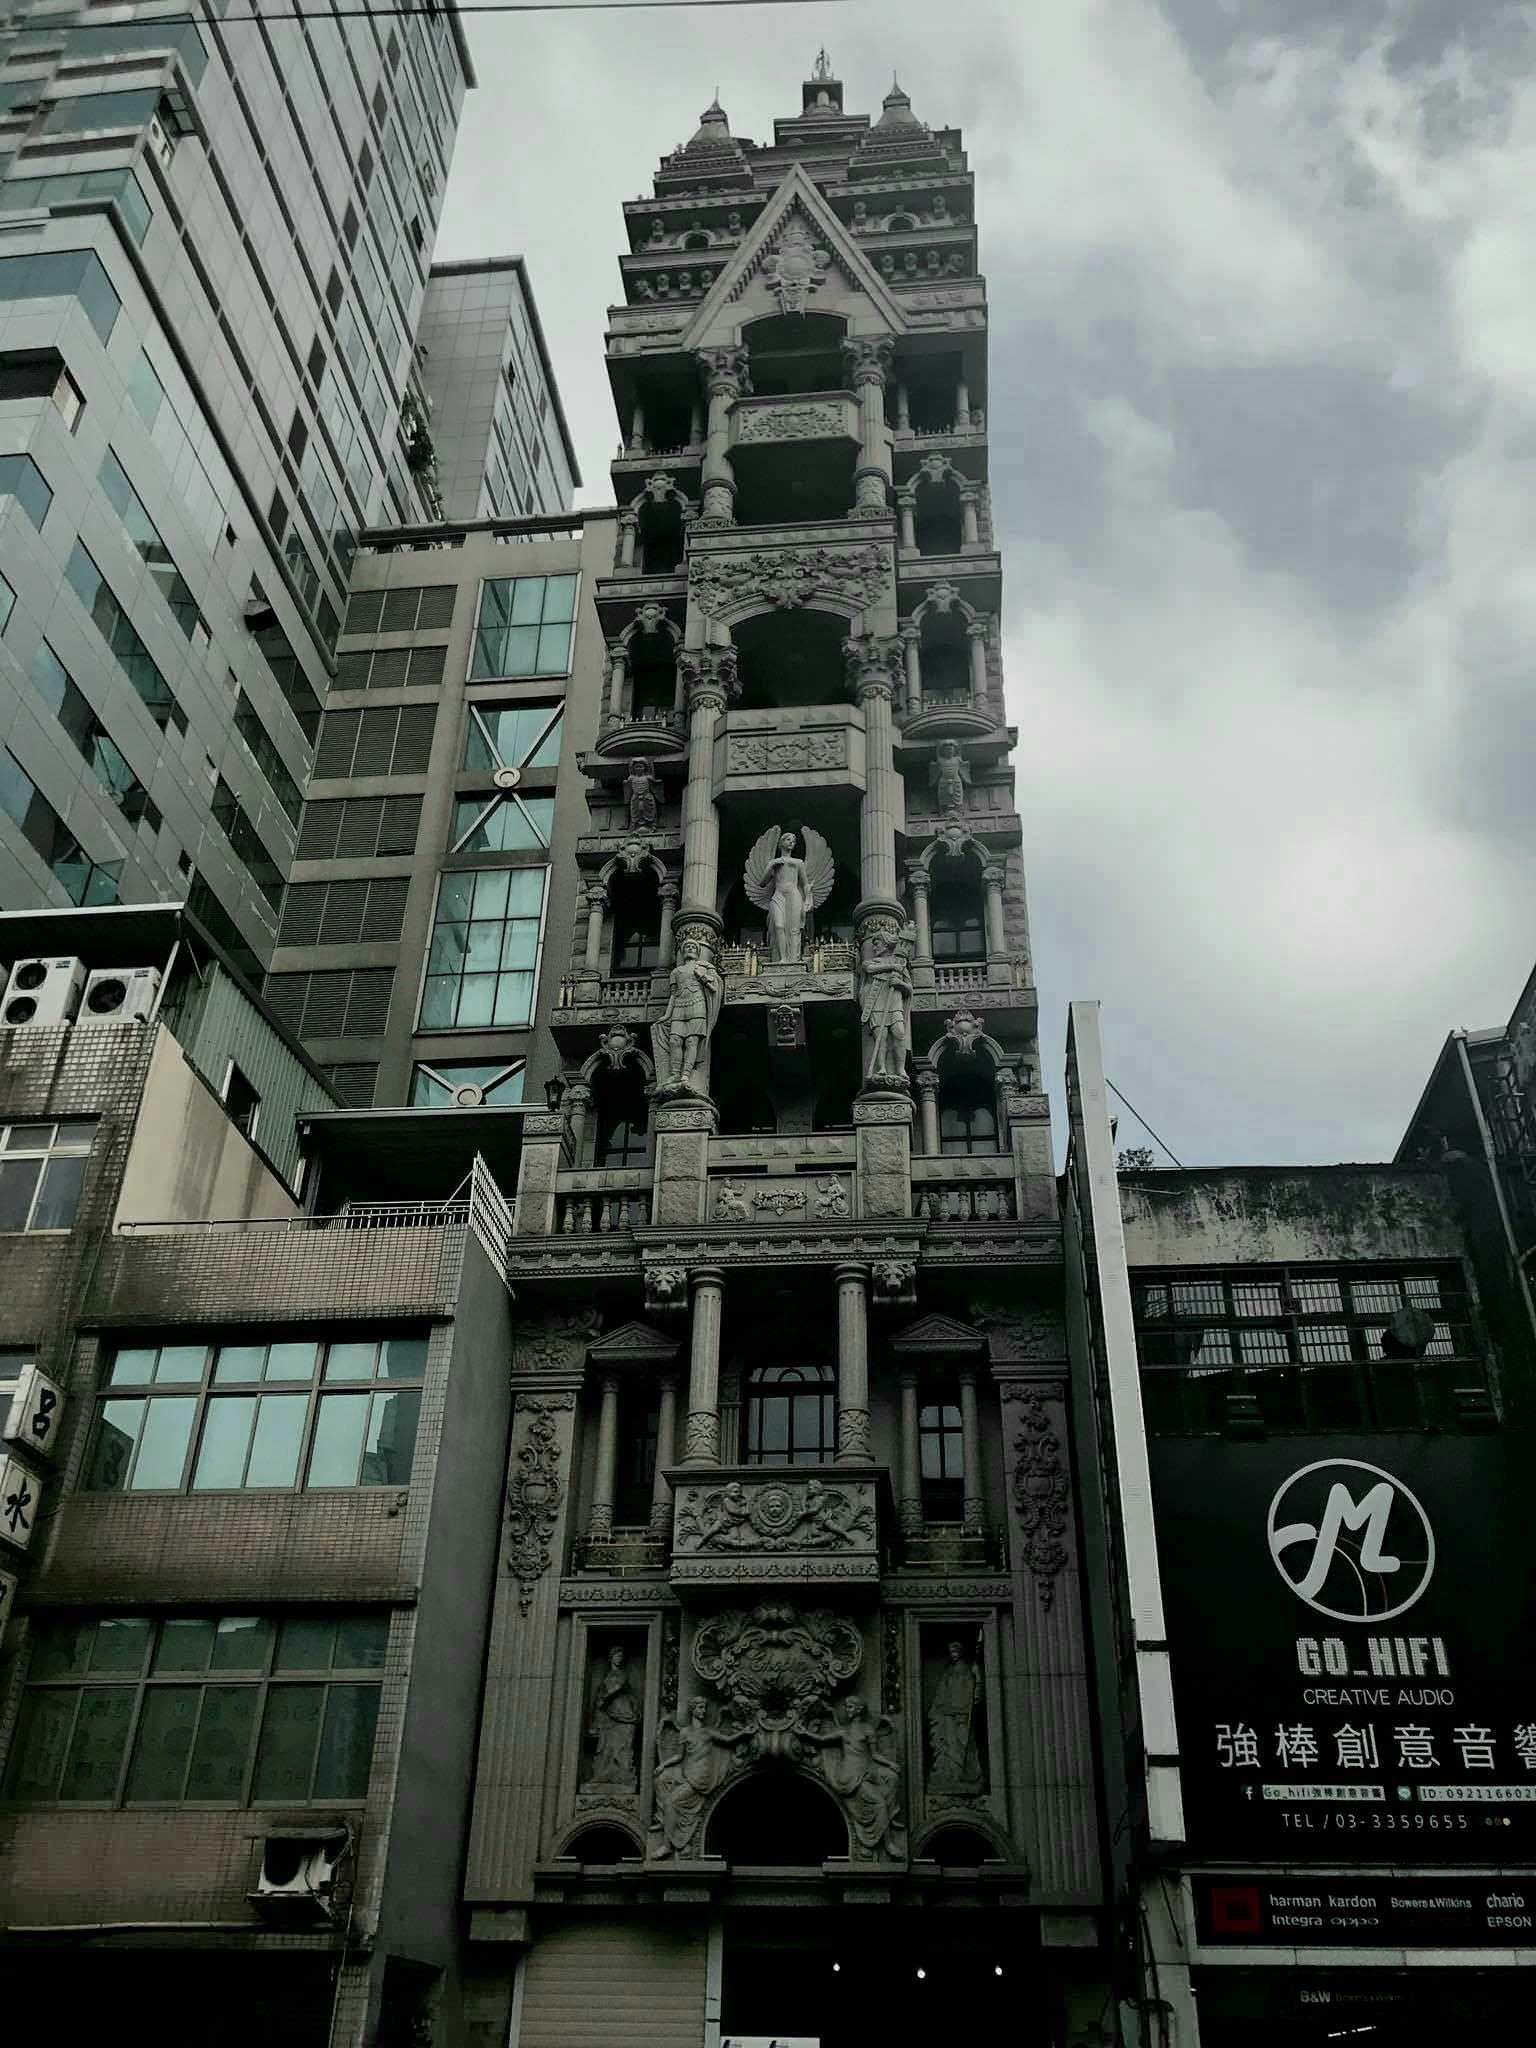 Vampire building